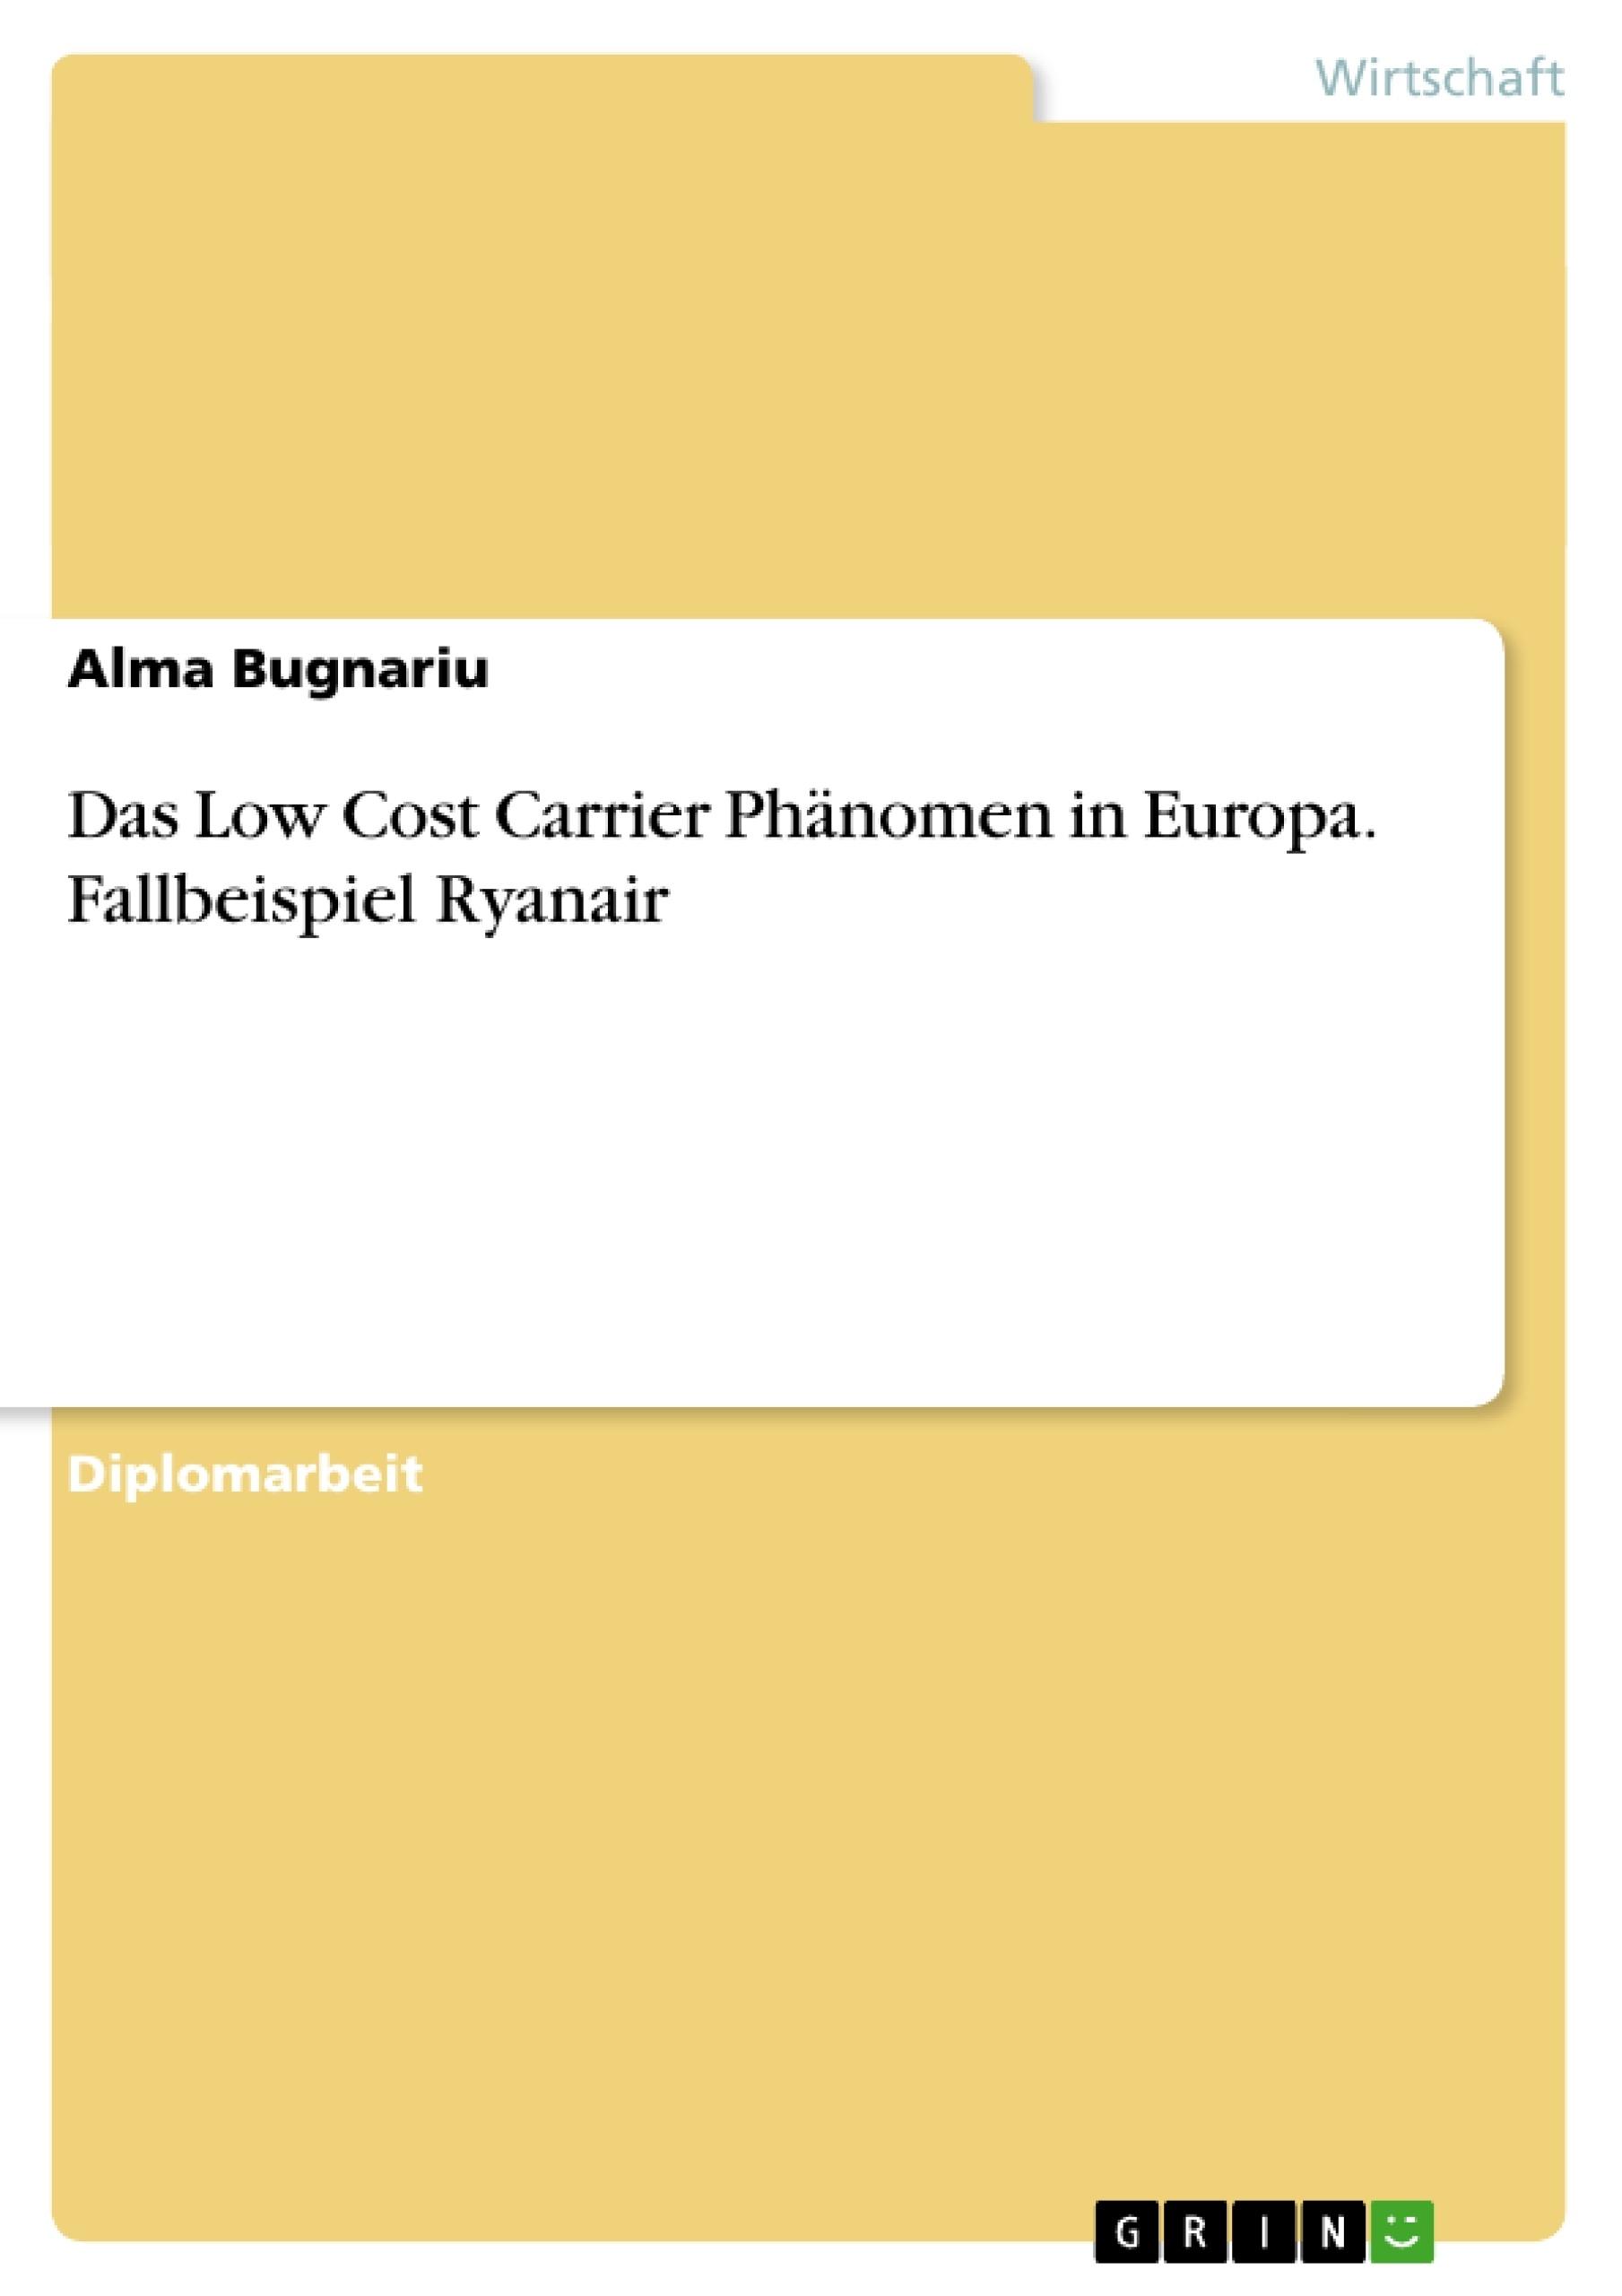 Titel: Das Low Cost Carrier Phänomen in Europa. Fallbeispiel Ryanair